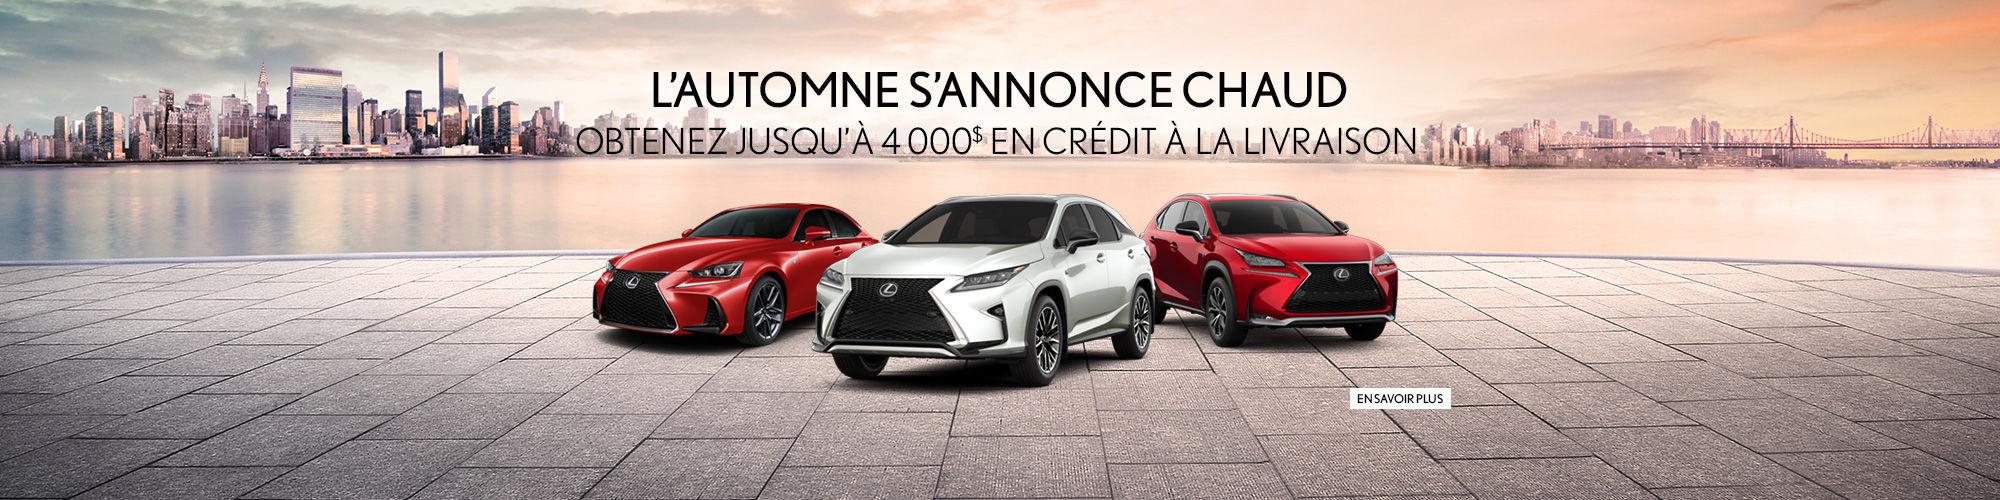 Lexus - Promo Septembre